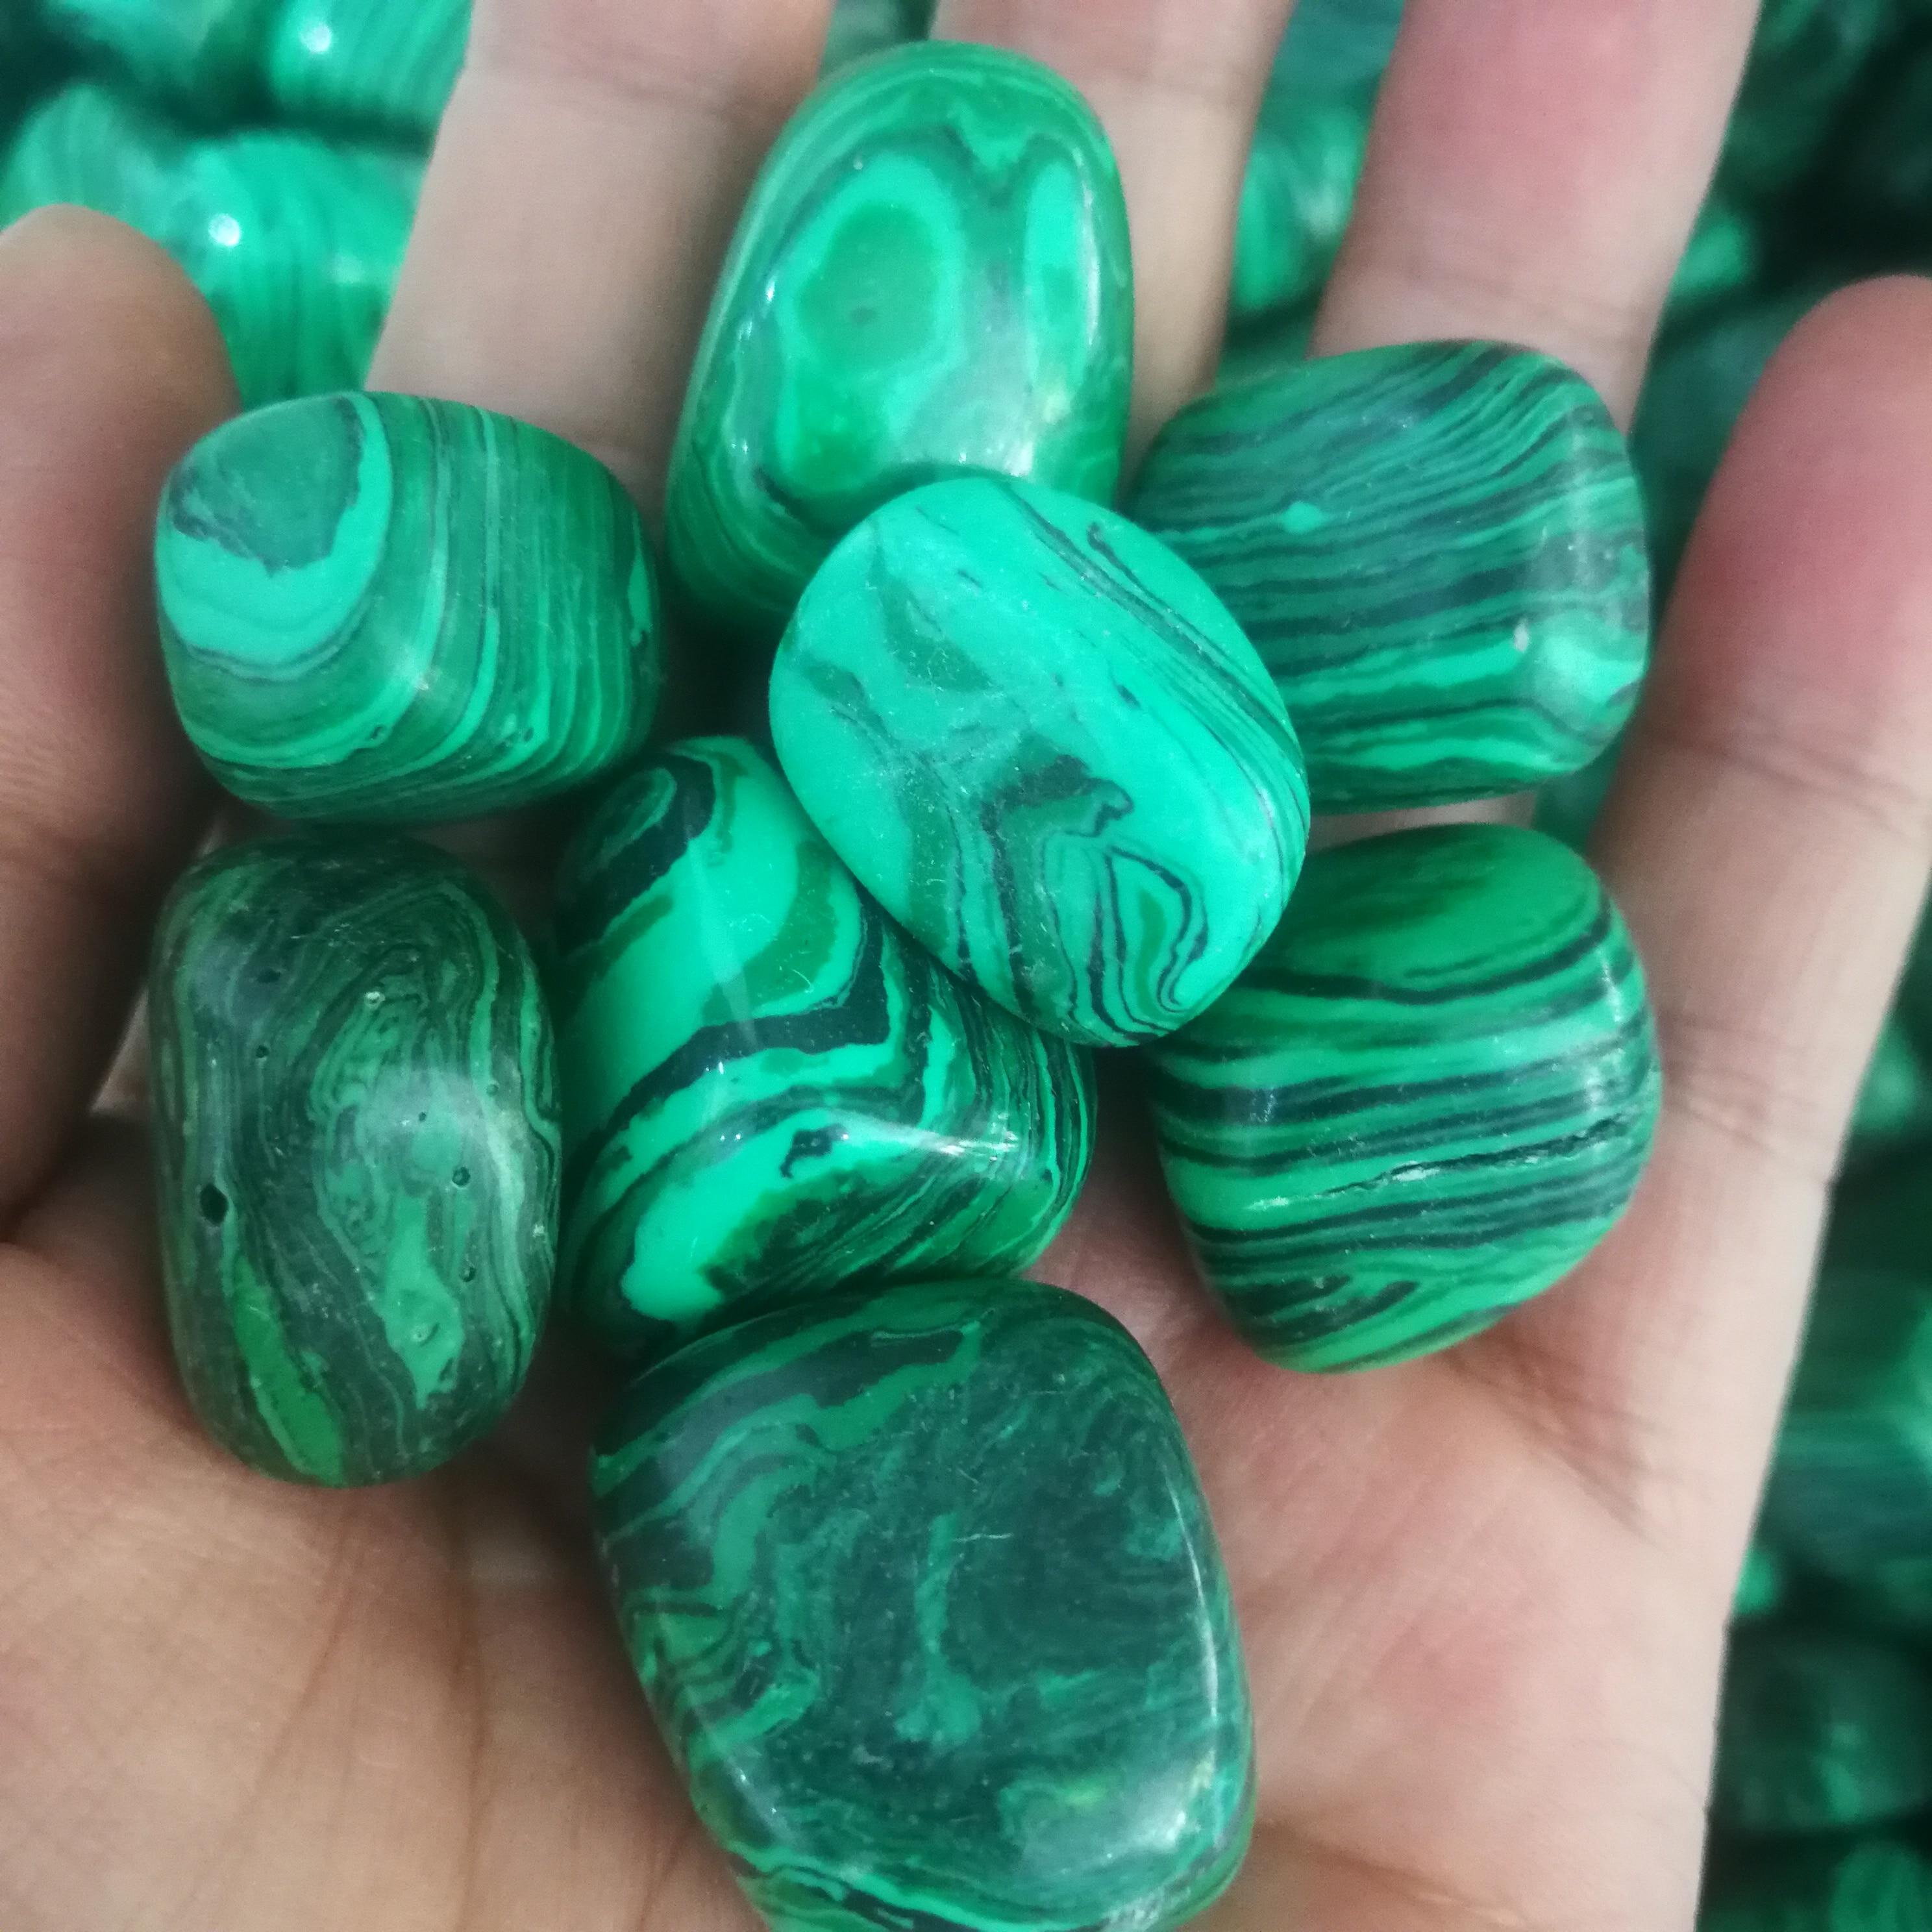 100-200g Natural malachite tumbled stone Polished Gemstone gravel for home decoration